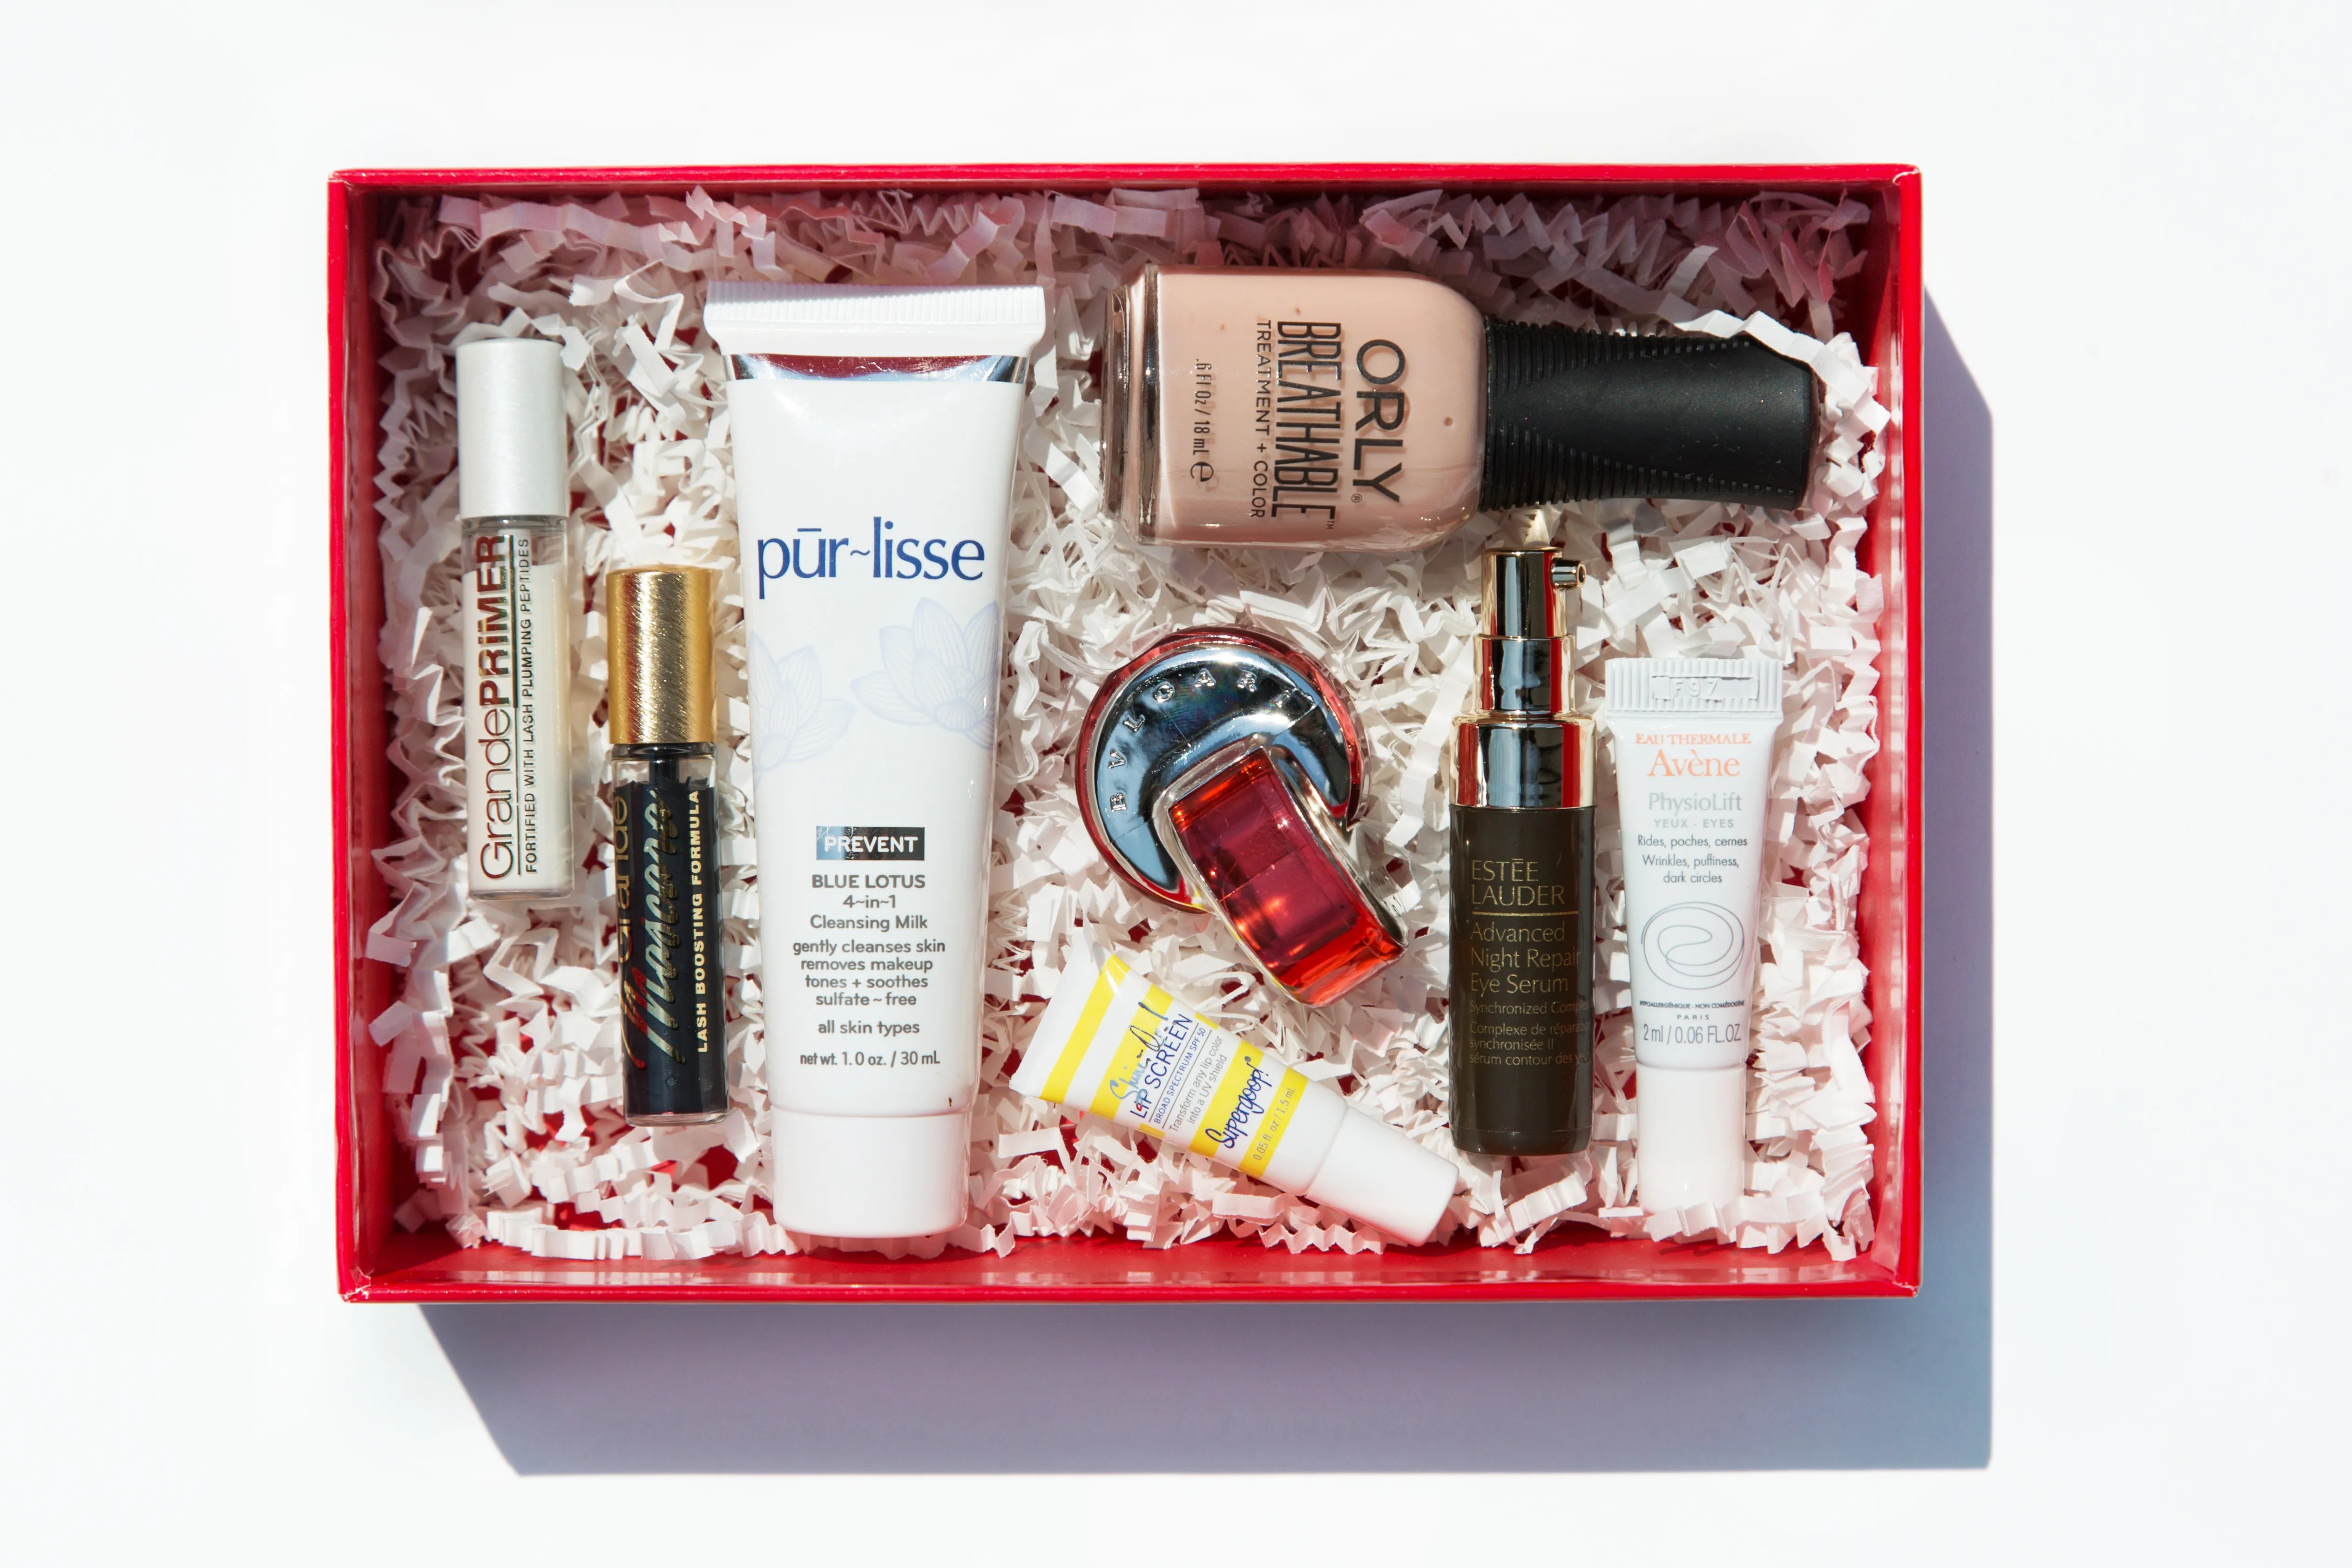 The September 2016 Allure Beauty Box Allure